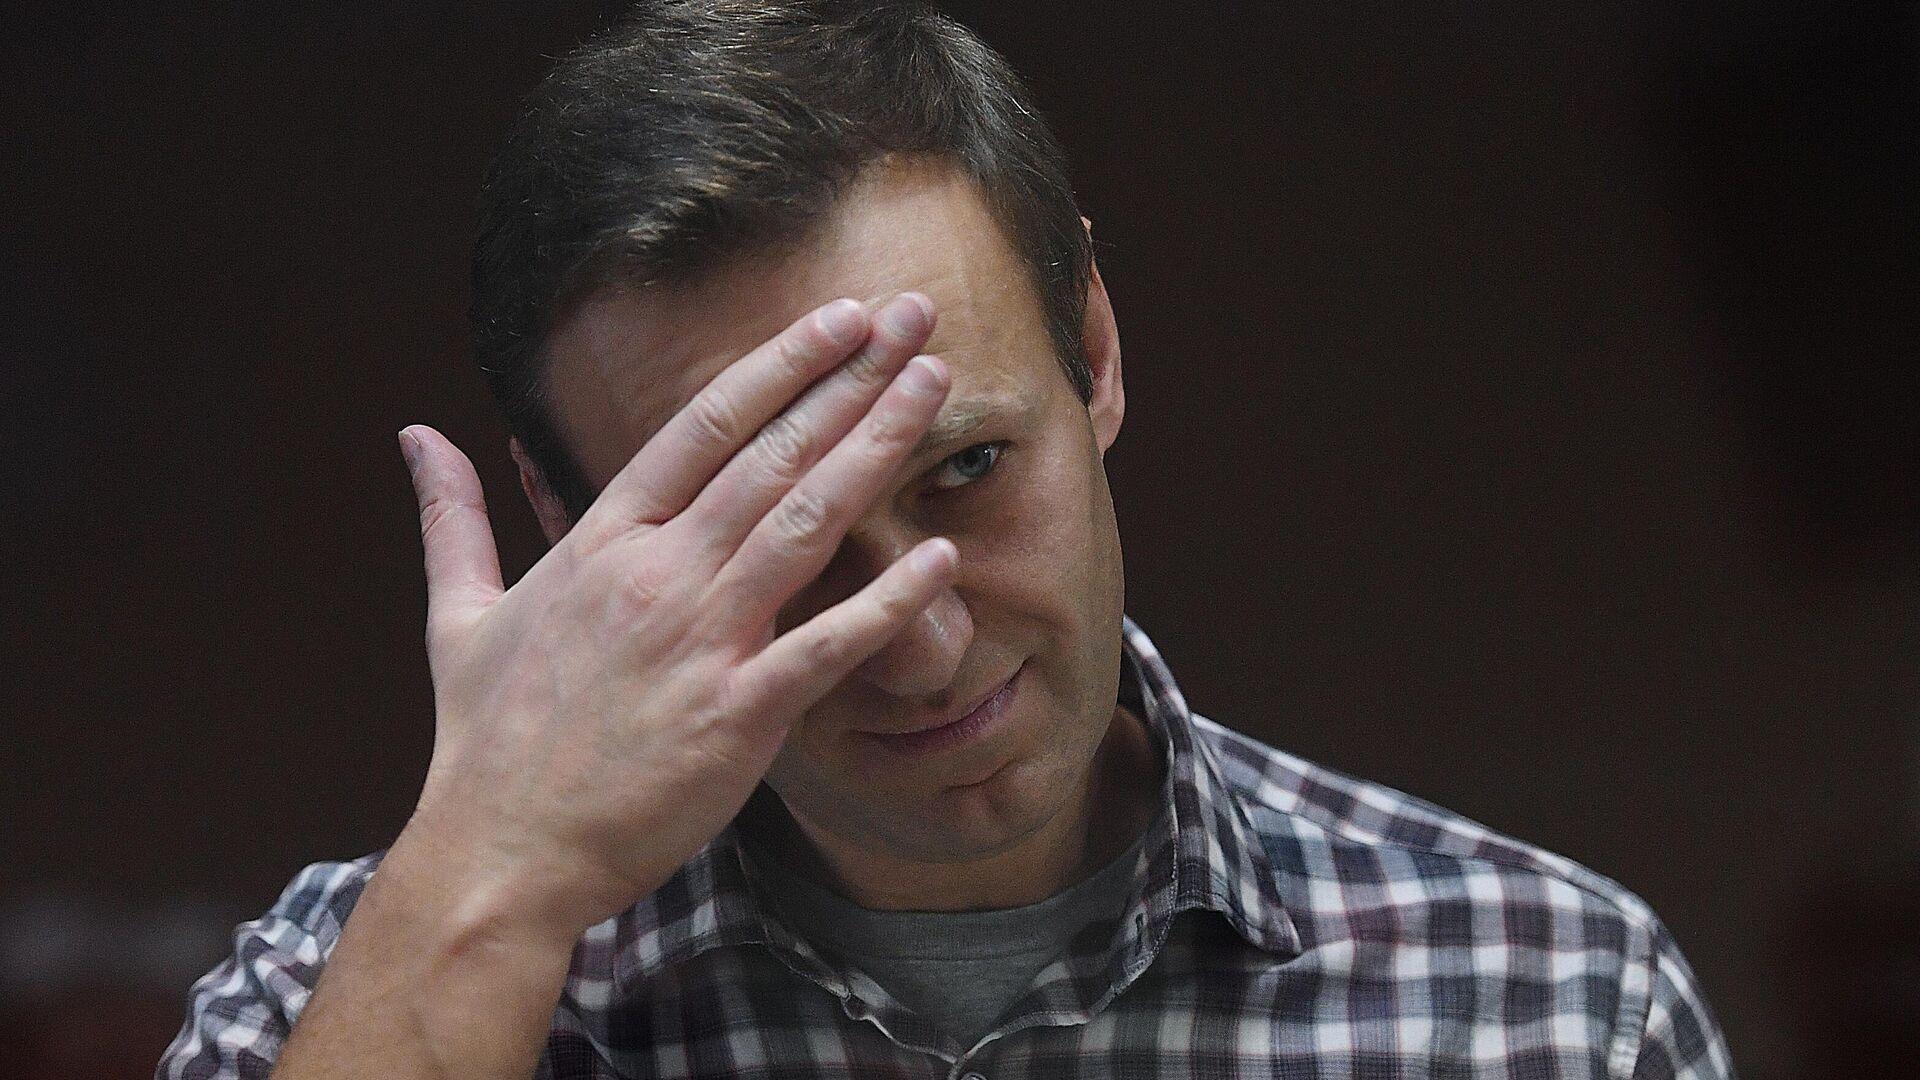 Alexéi Navalni, bloguero opositor ruso - Sputnik Mundo, 1920, 09.06.2021